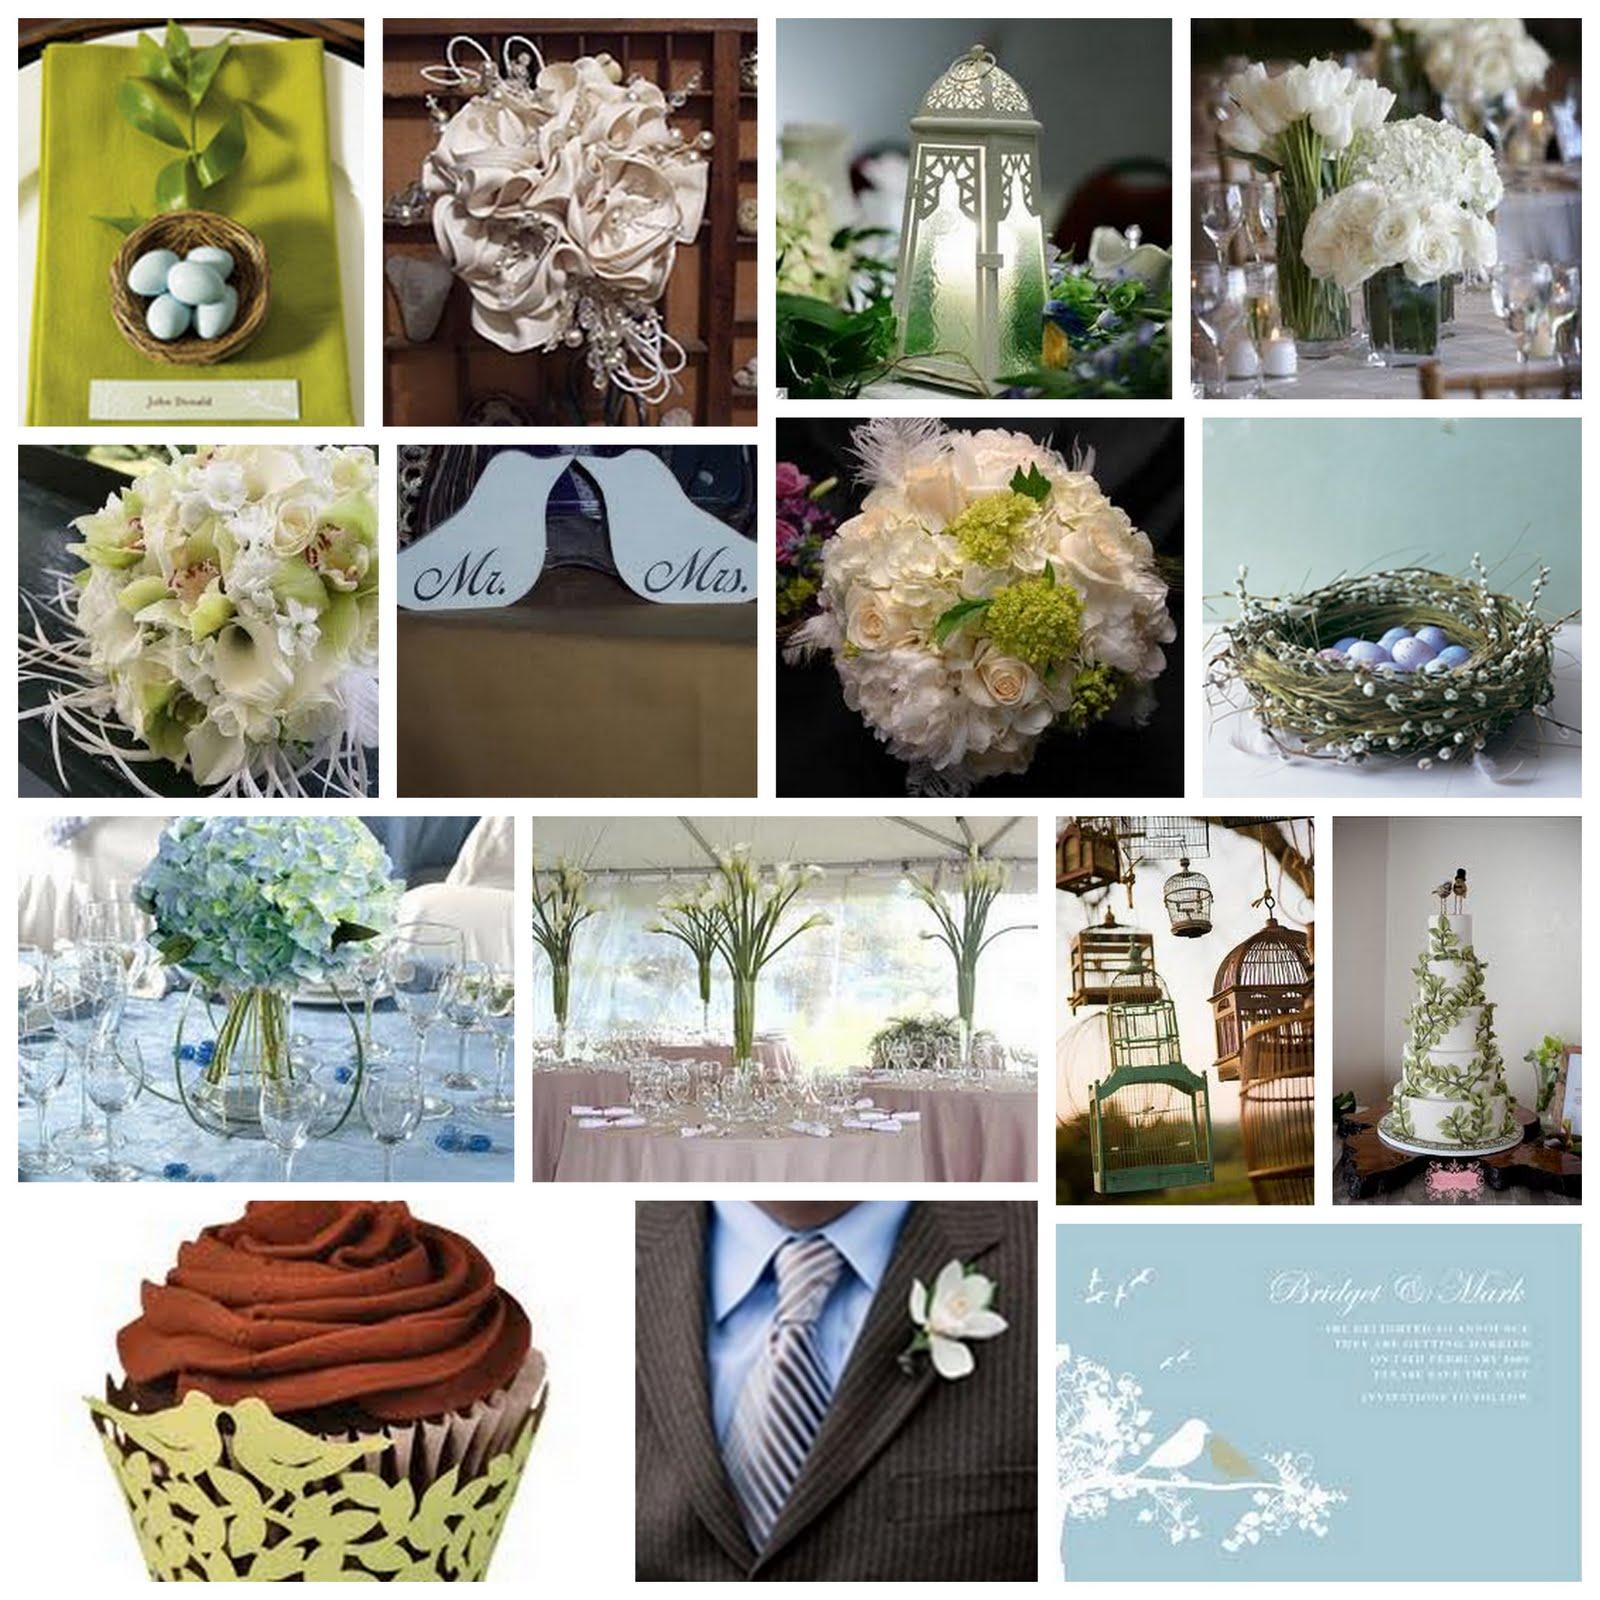 Kirkbrides Love Birds Wedding Inspiration Board